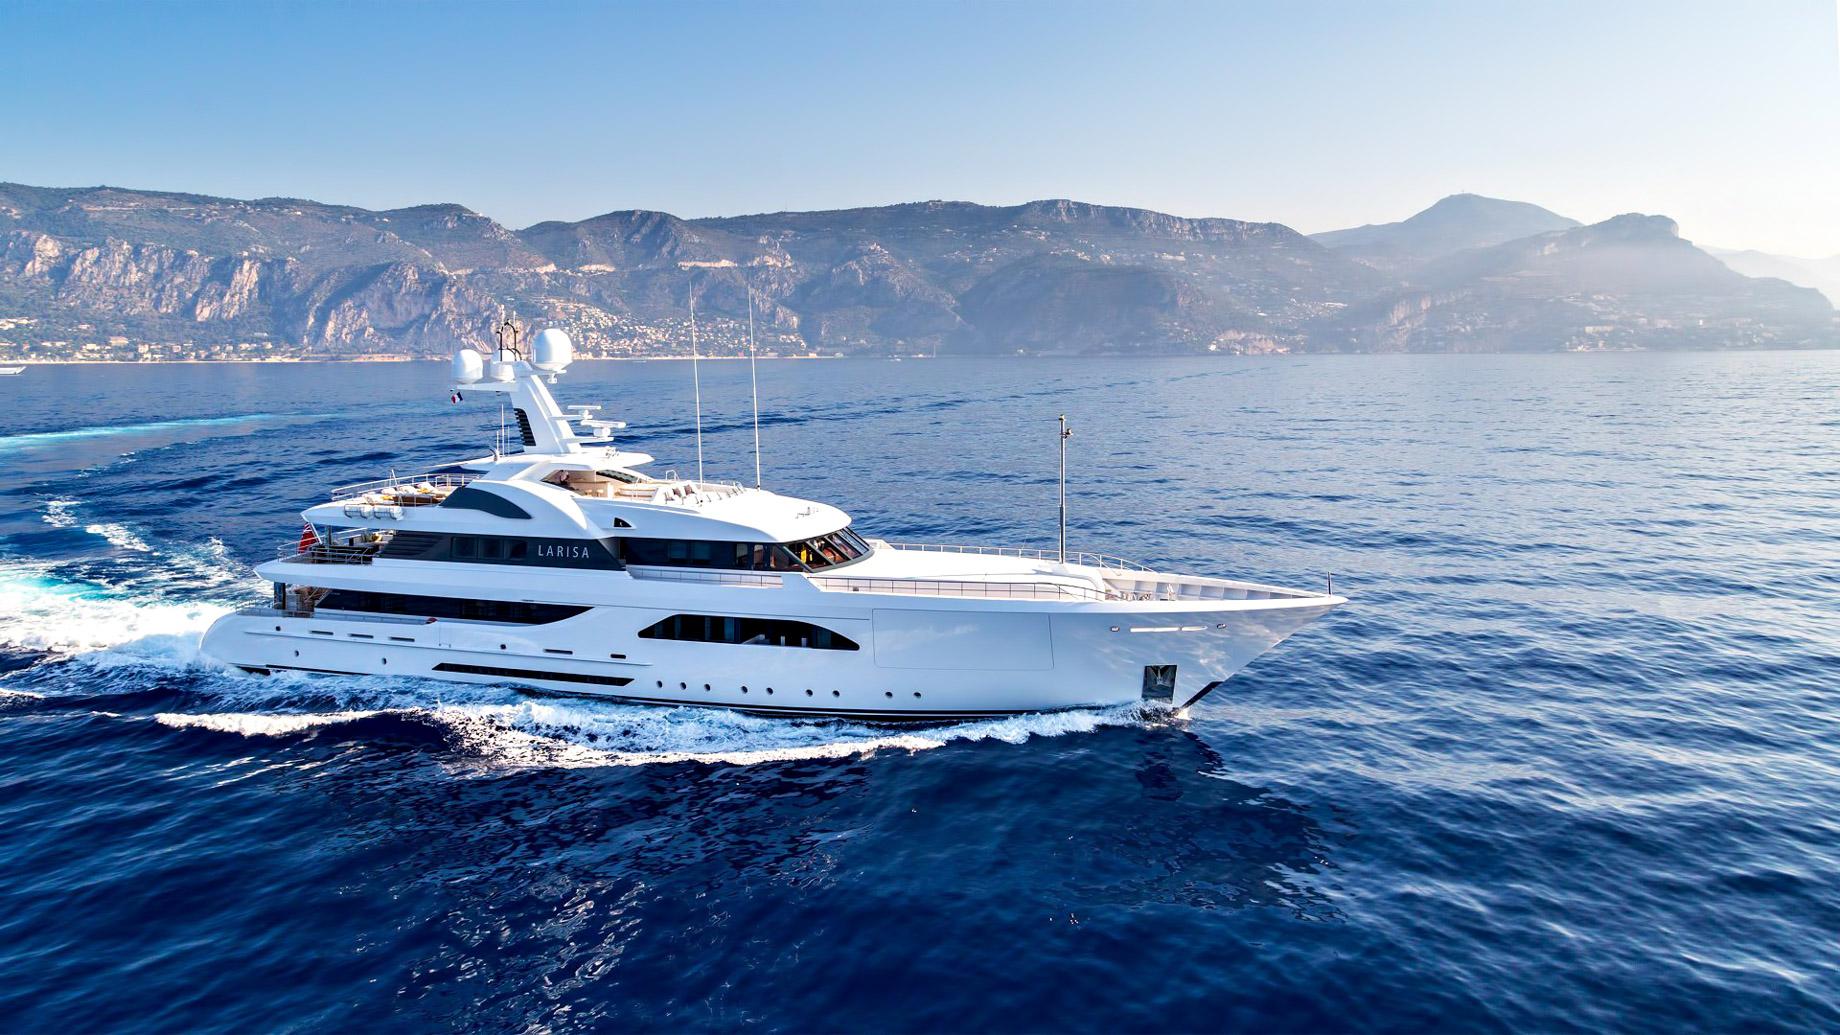 LARISA Superyacht – Dutch Built Quality and Spectacular Luxury Design